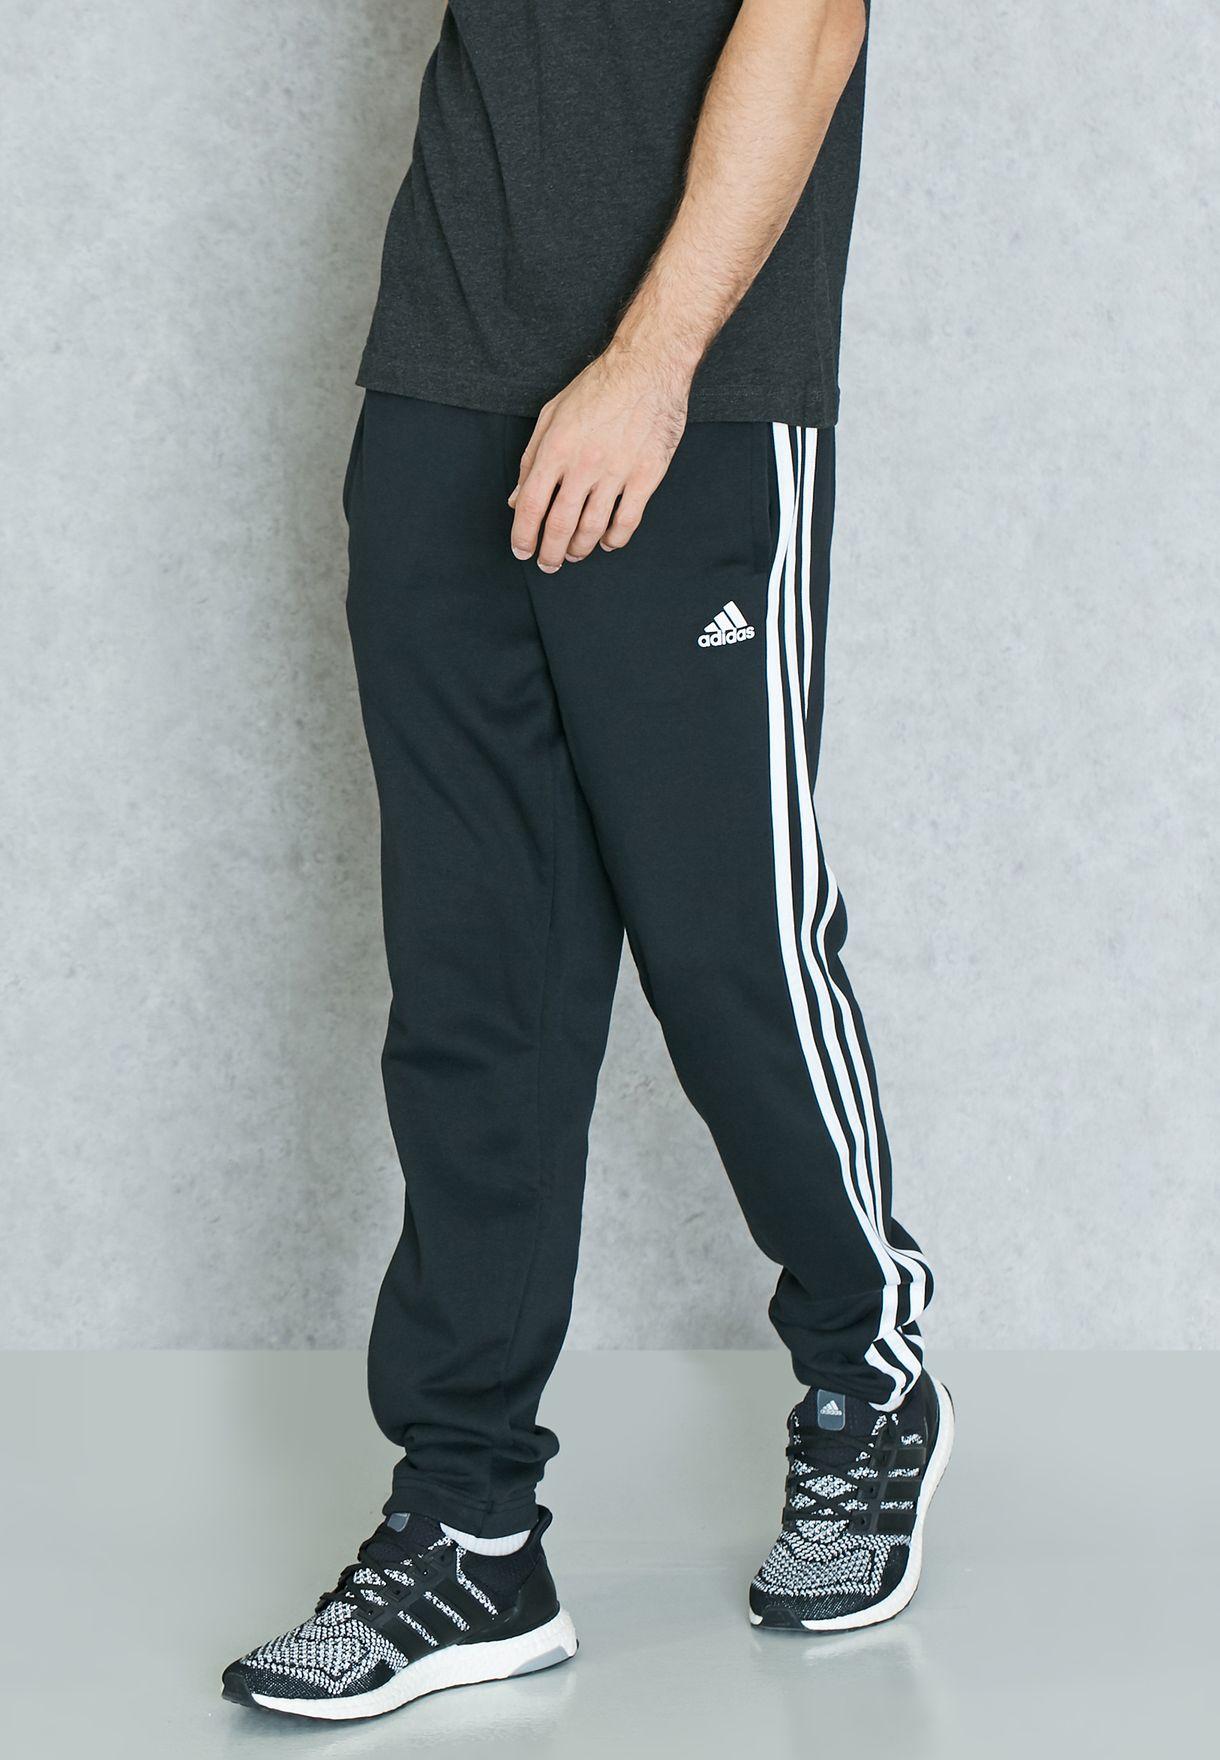 ampliar Norteamérica carrera  Buy adidas black Essential 3 Stripe Sweatpants for Men in MENA, Worldwide    BK7446